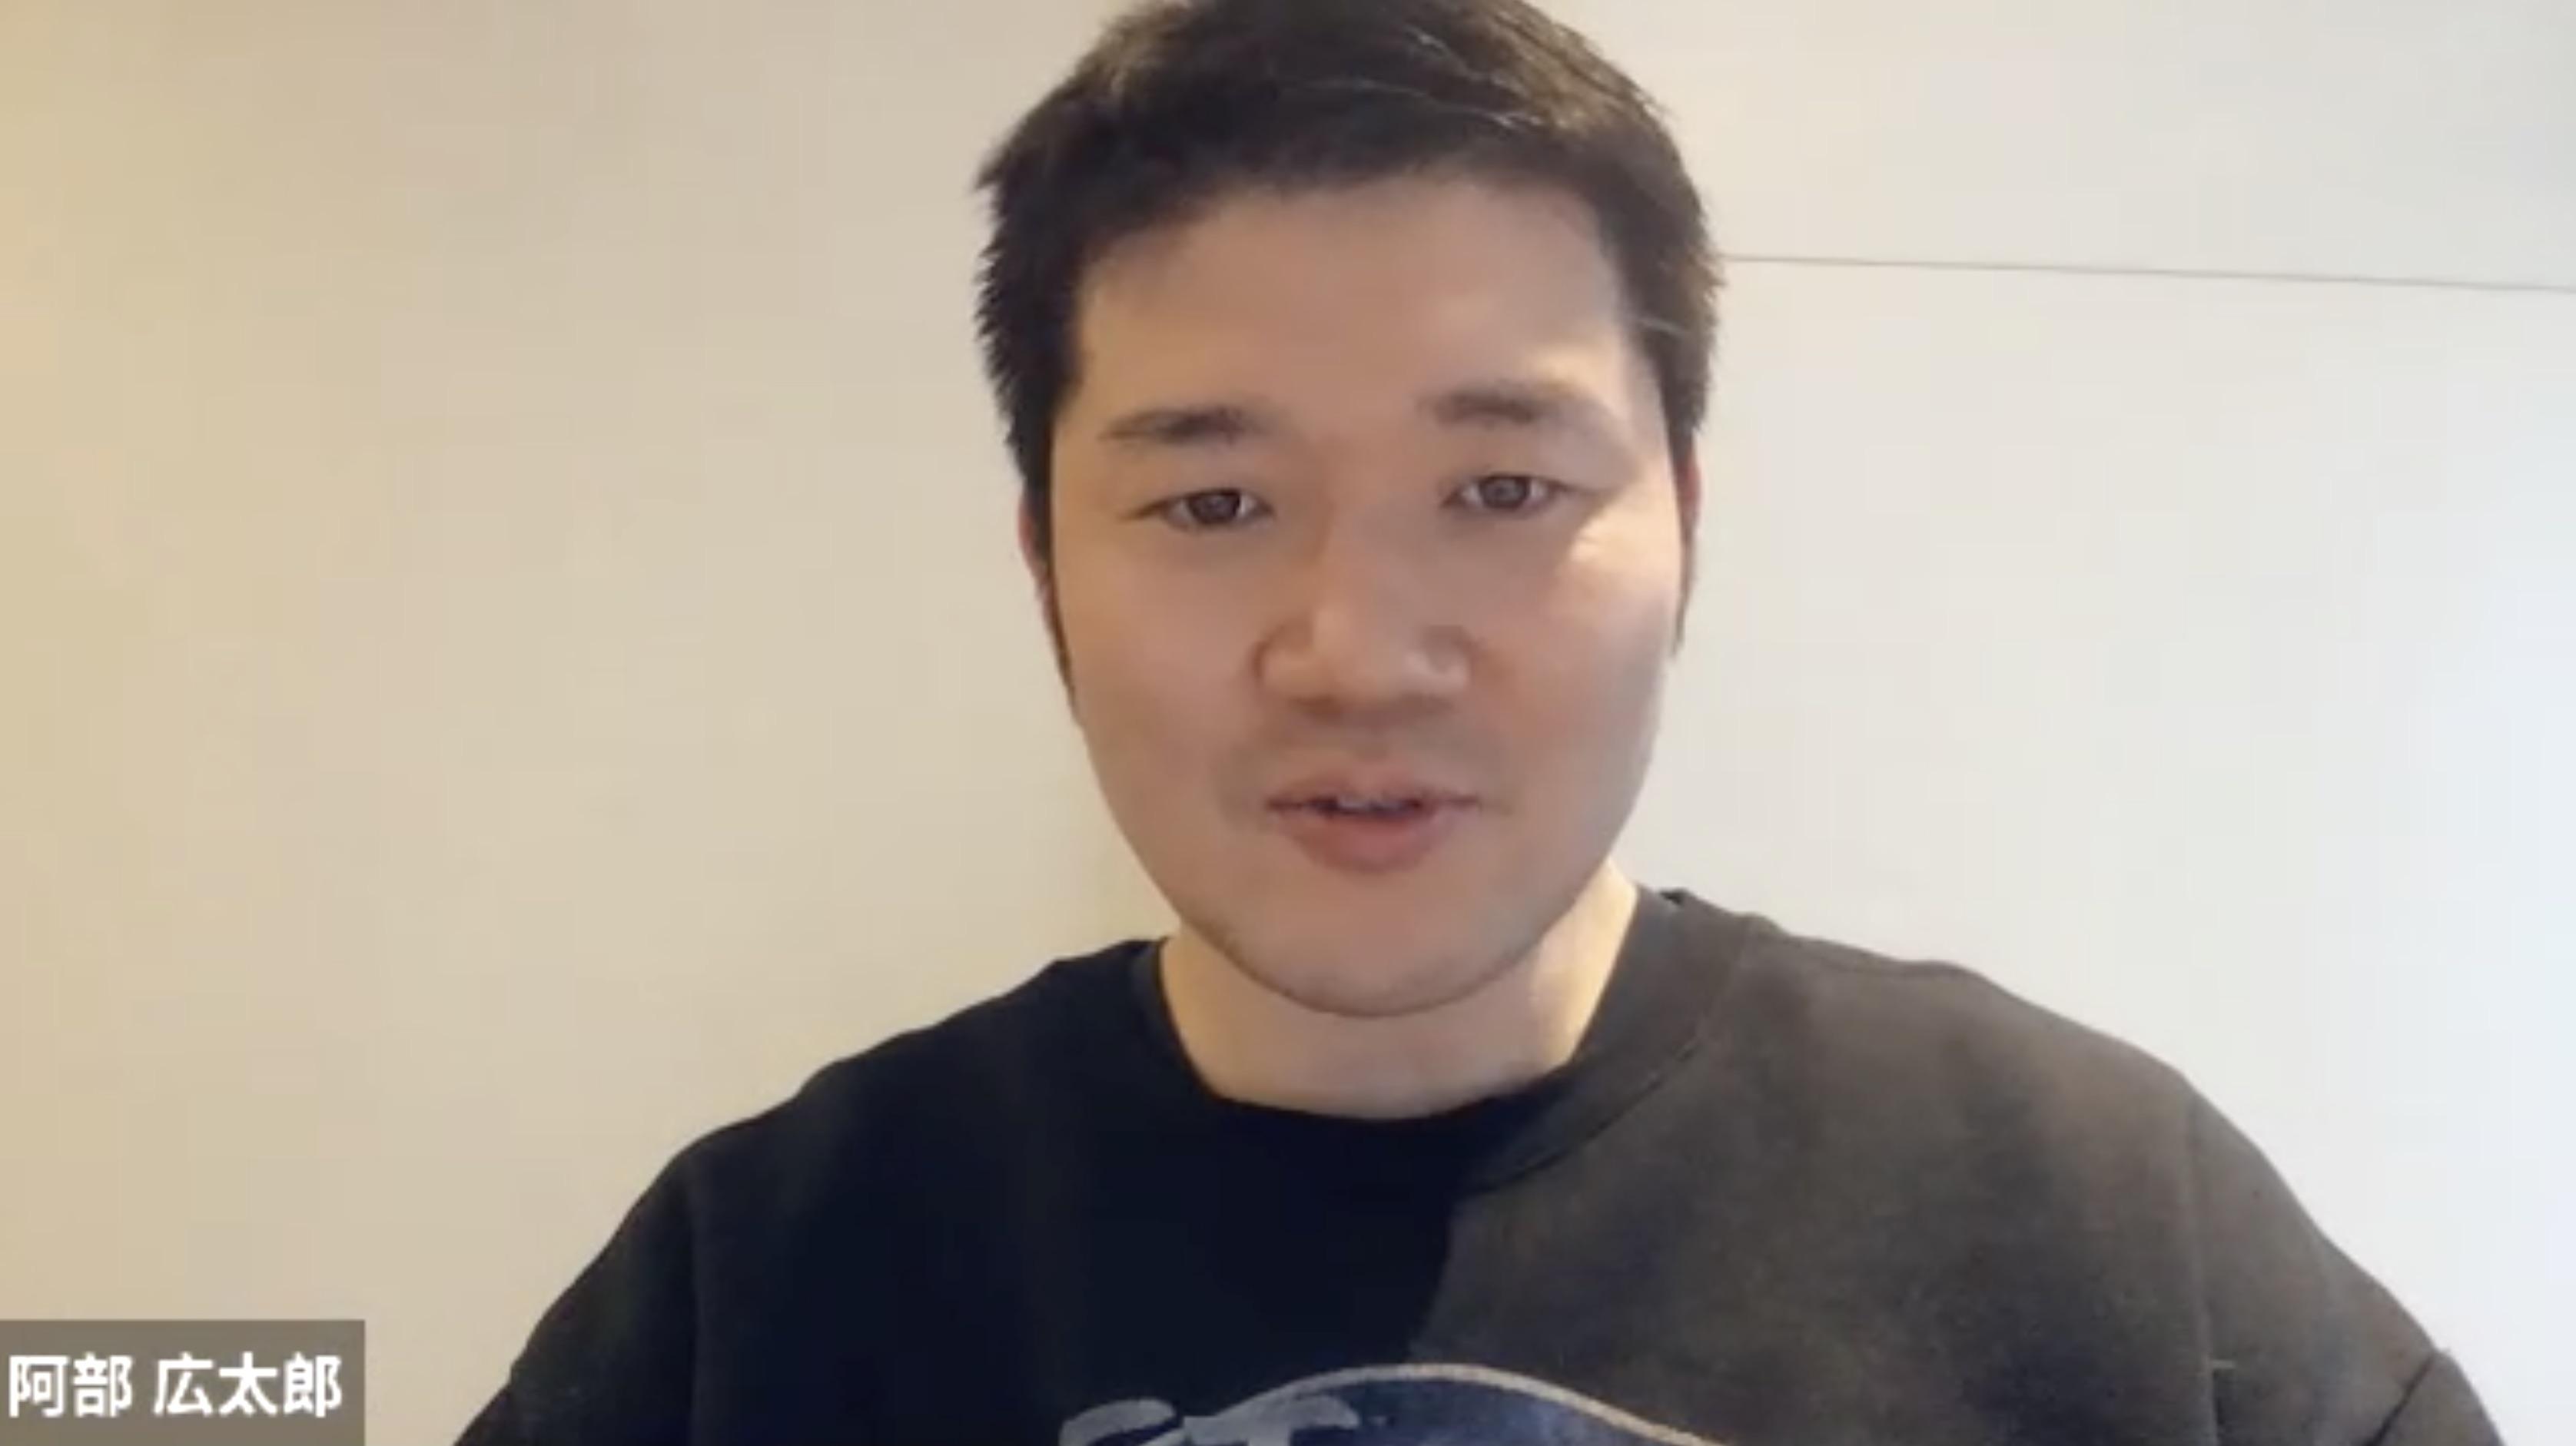 =【MEETSCAREER(ミーツキャリア)】阿部広太郎さんインタビュー画像2